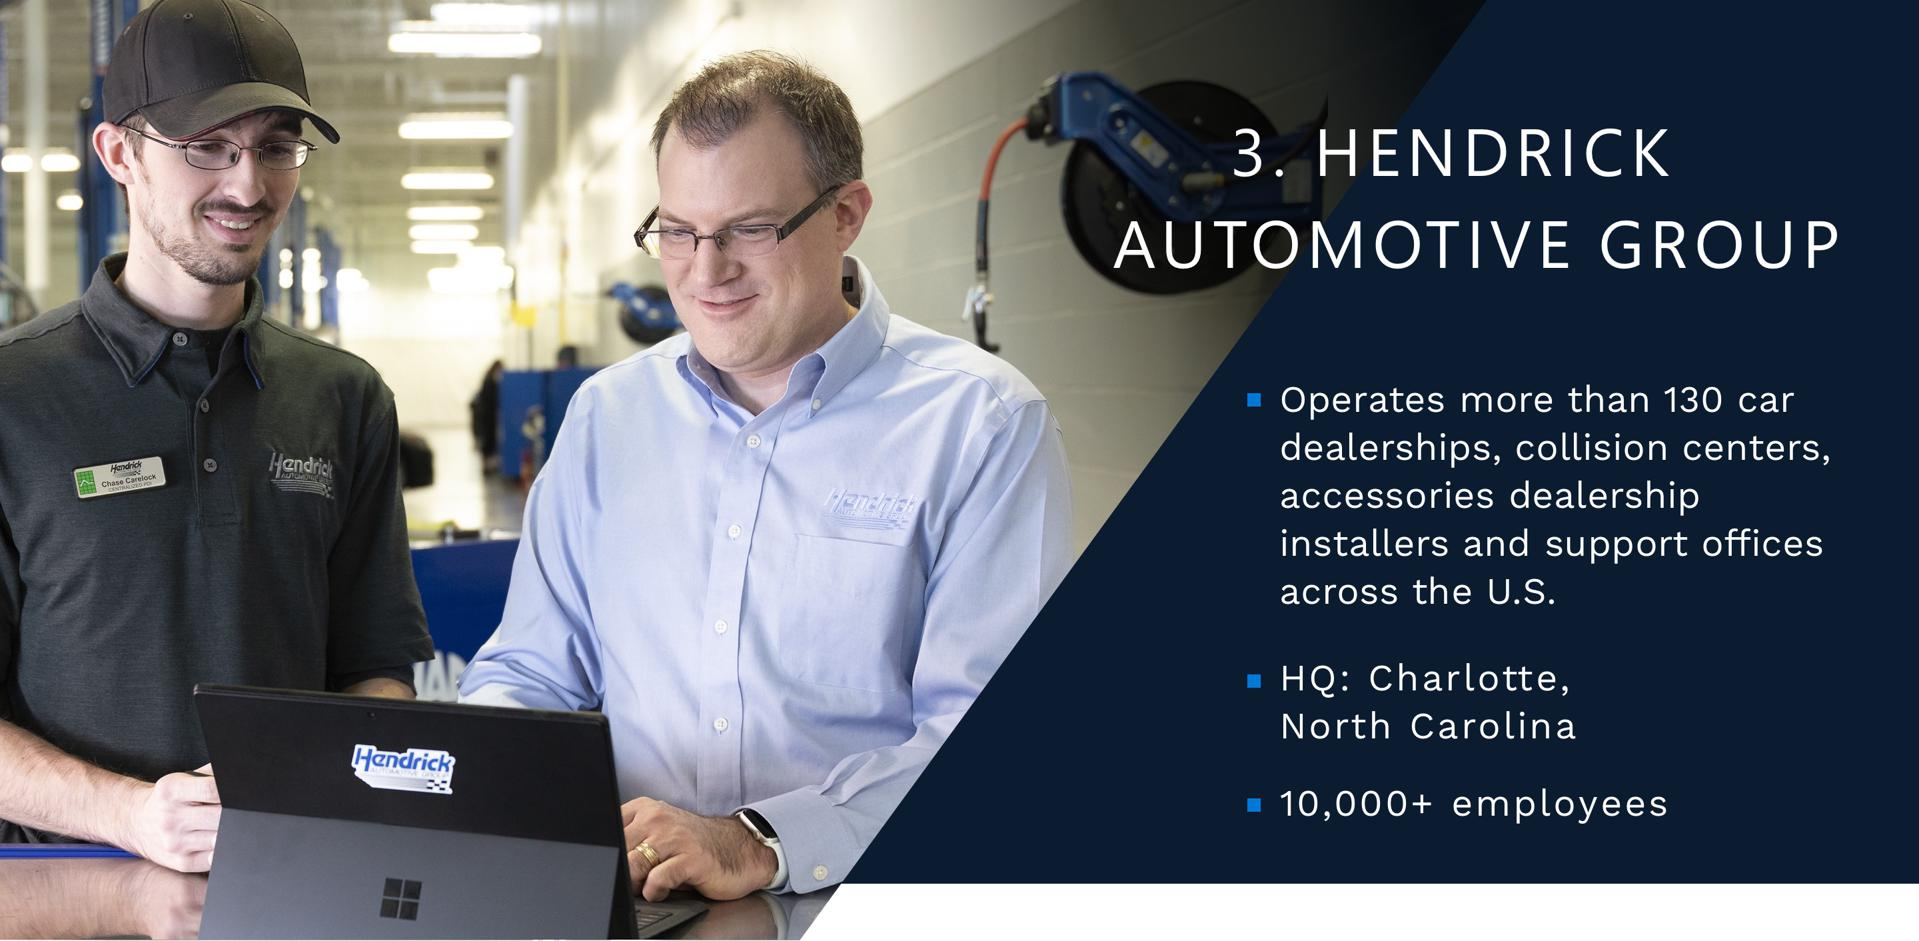 3 - Hendrick Automotive Group